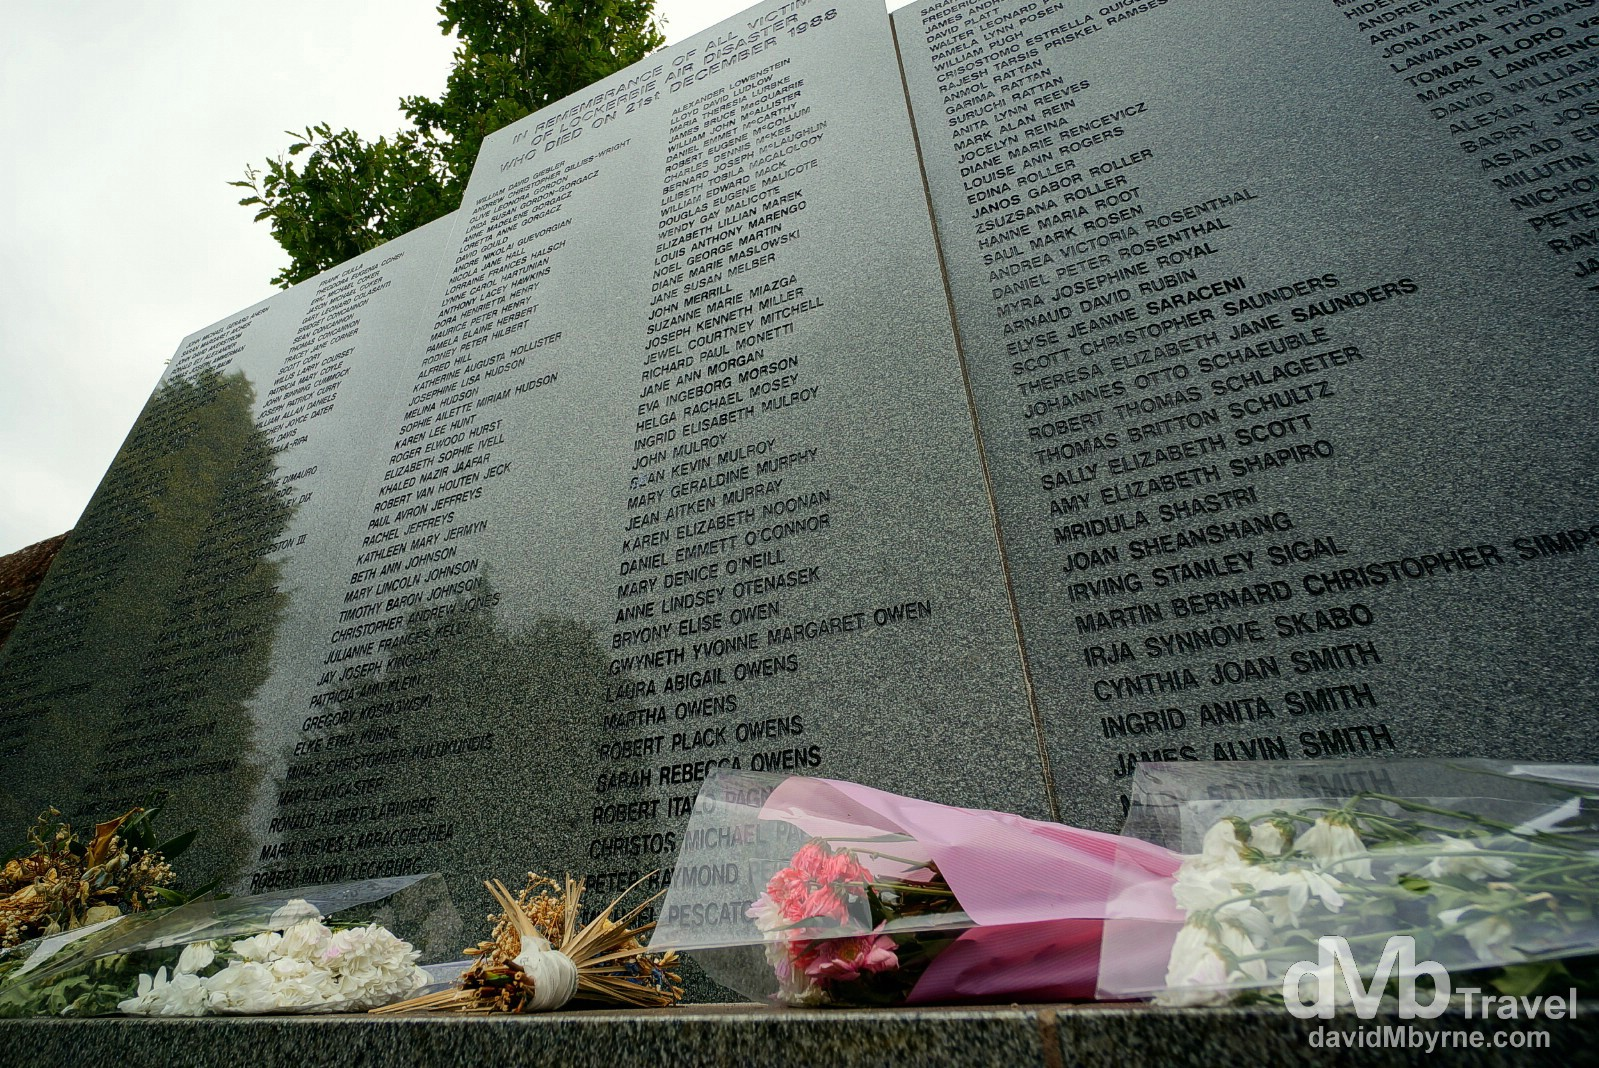 The Lockerbie Air Disaster Memorial in the Garden of Remembrance, Dryfesdale Cemetery, Lockerbie, Dumfries and Galloway, Scotland. September 19, 2014.